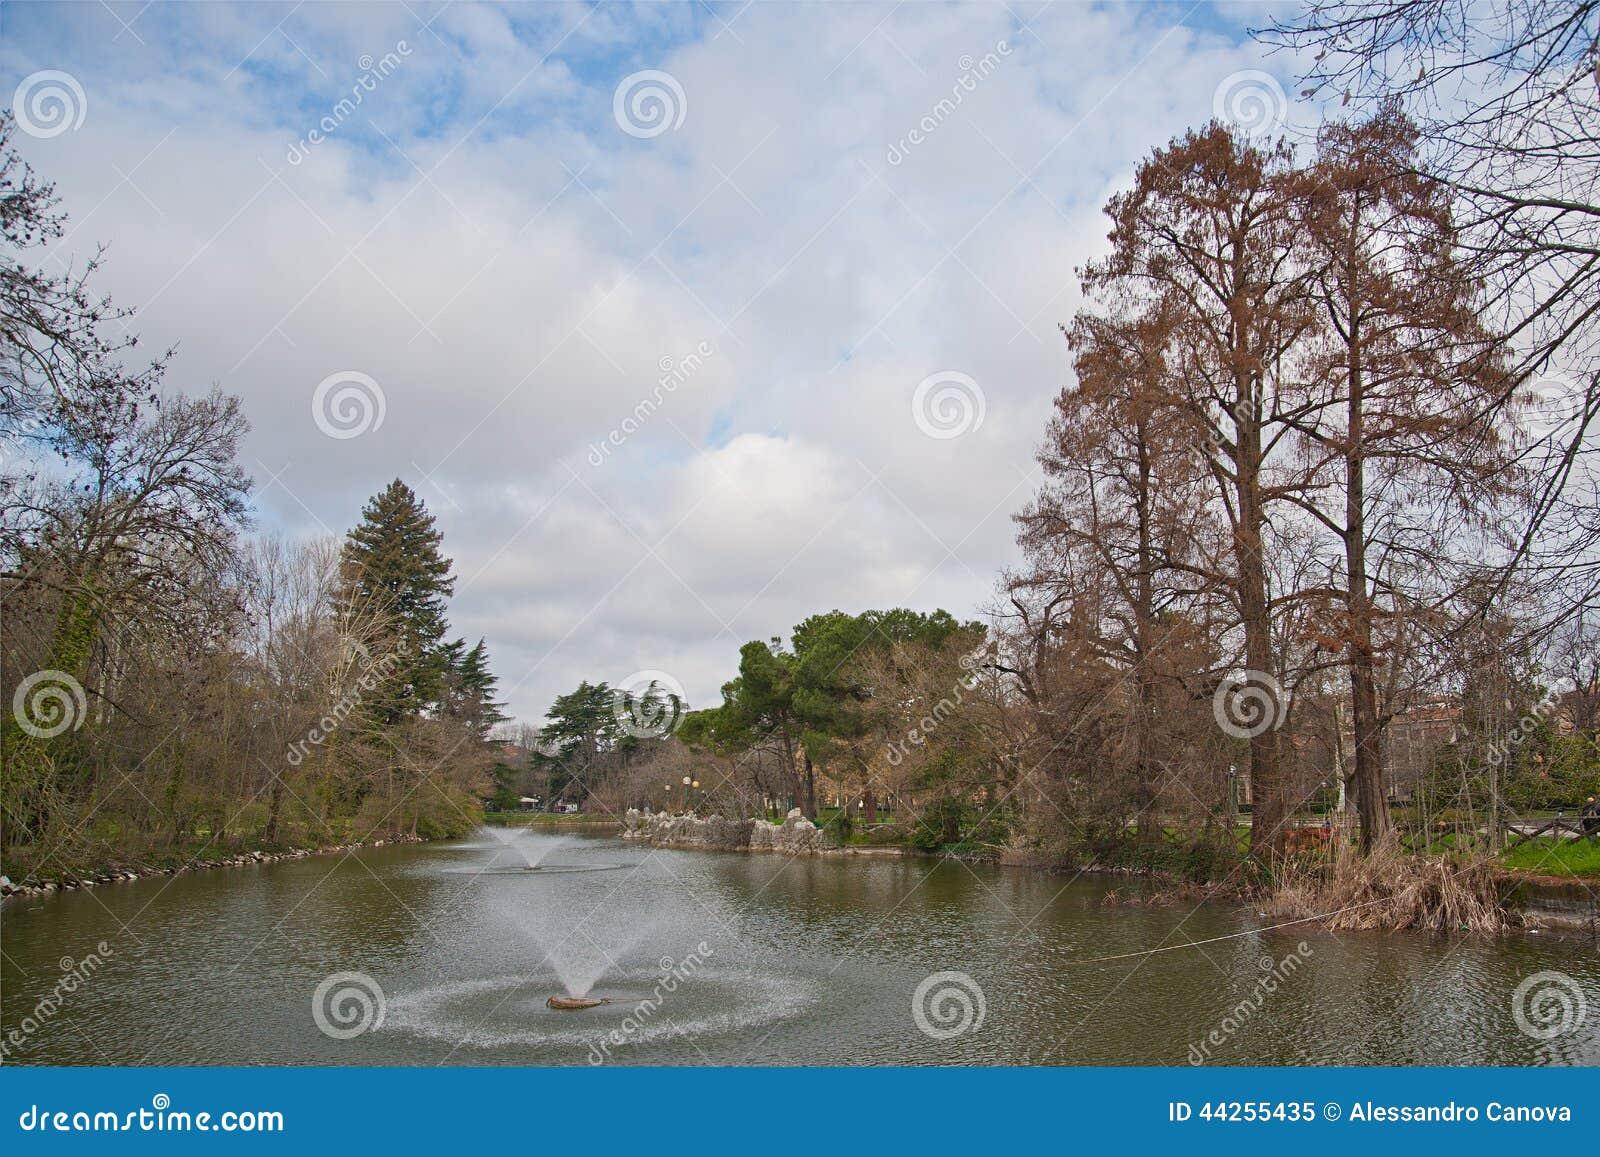 Pond at giardini margherita bologna stock image image of garden